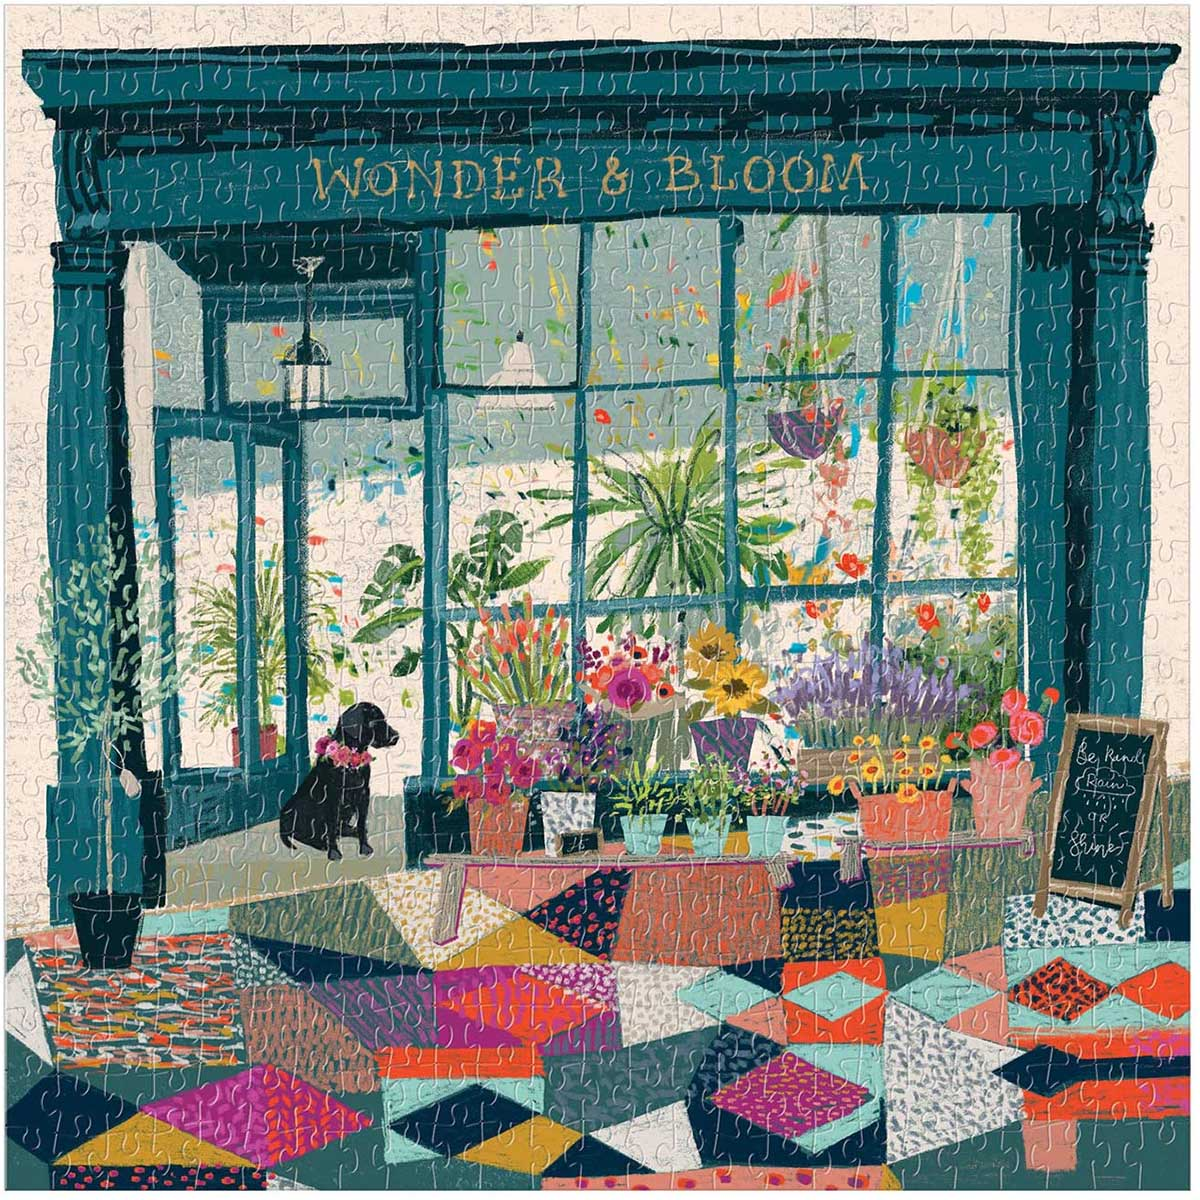 Wonder & Bloom Flowers Jigsaw Puzzle